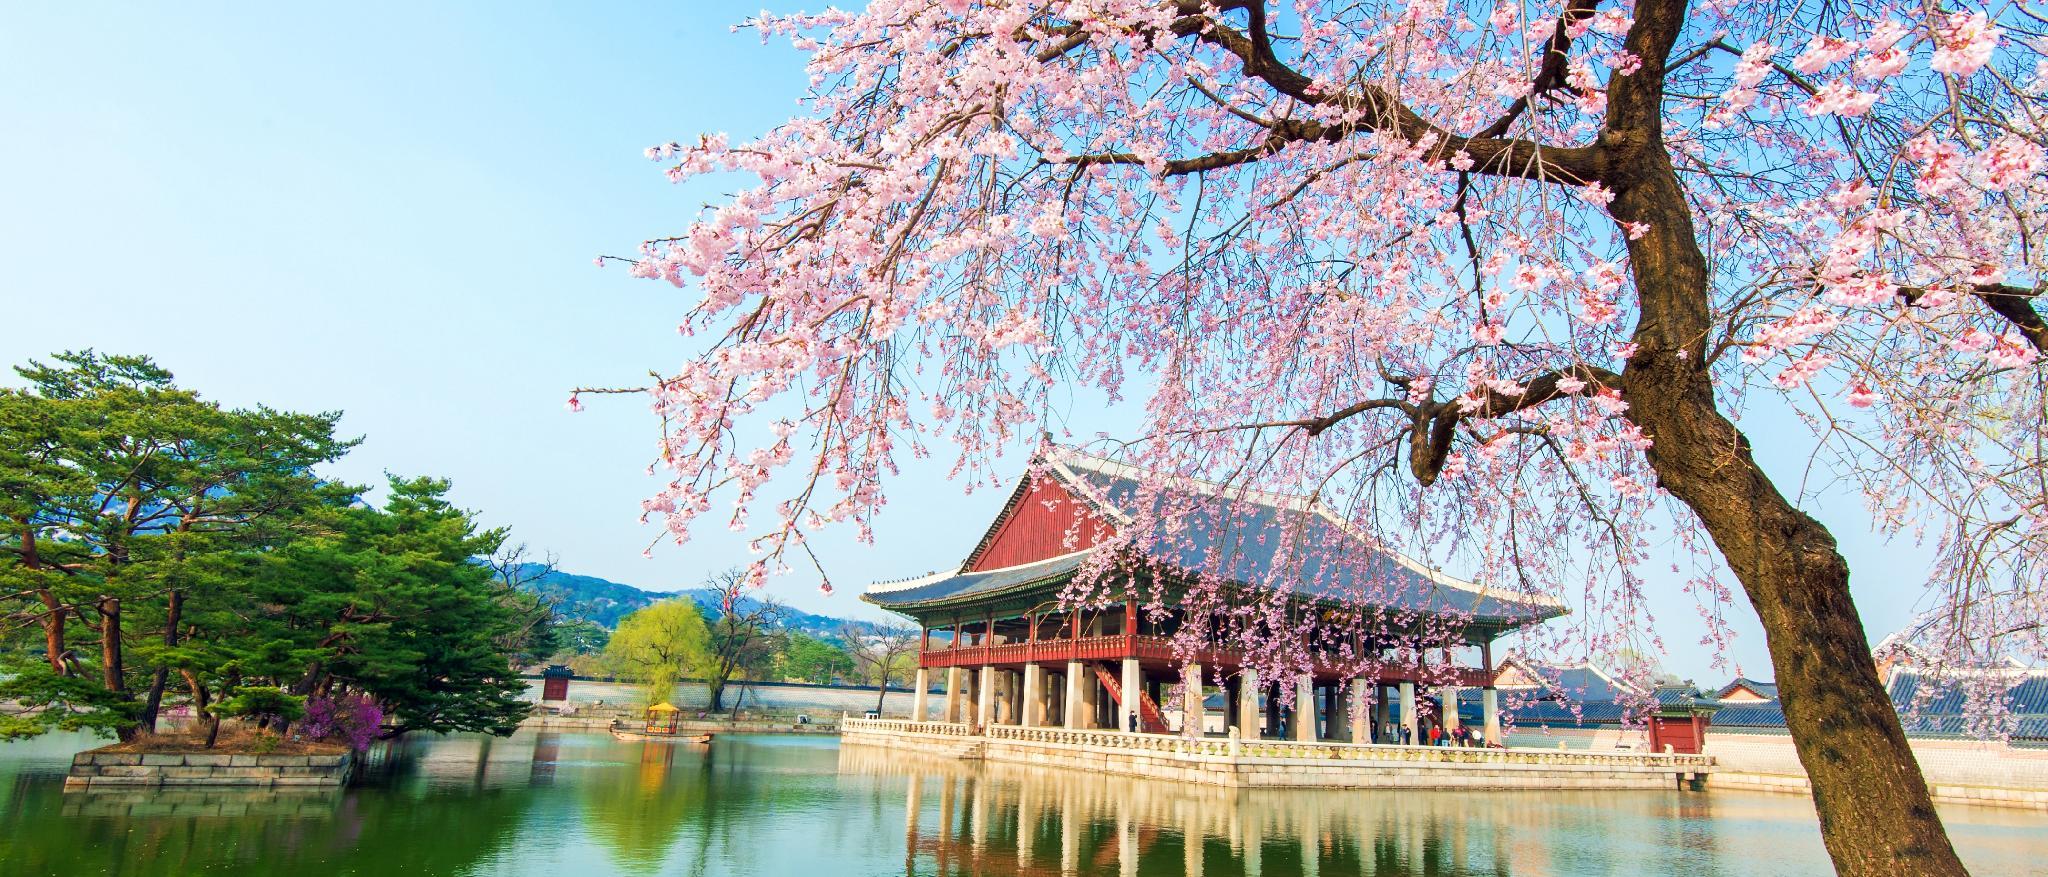 Seoul Hotels, South Korea: Great savings and real  - Agoda